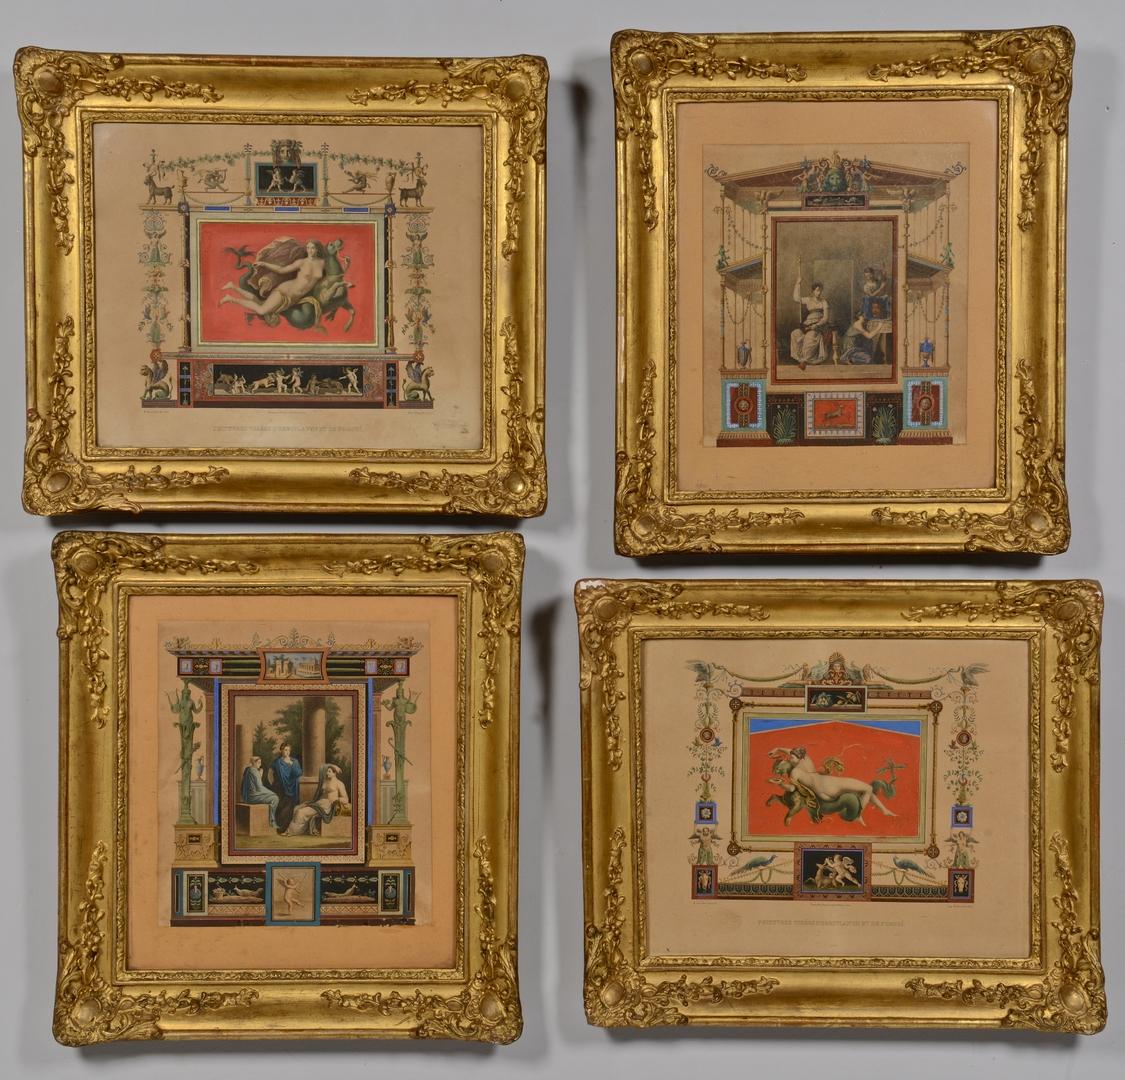 Lot 212: 4 Pompeii Prints, 19th c.